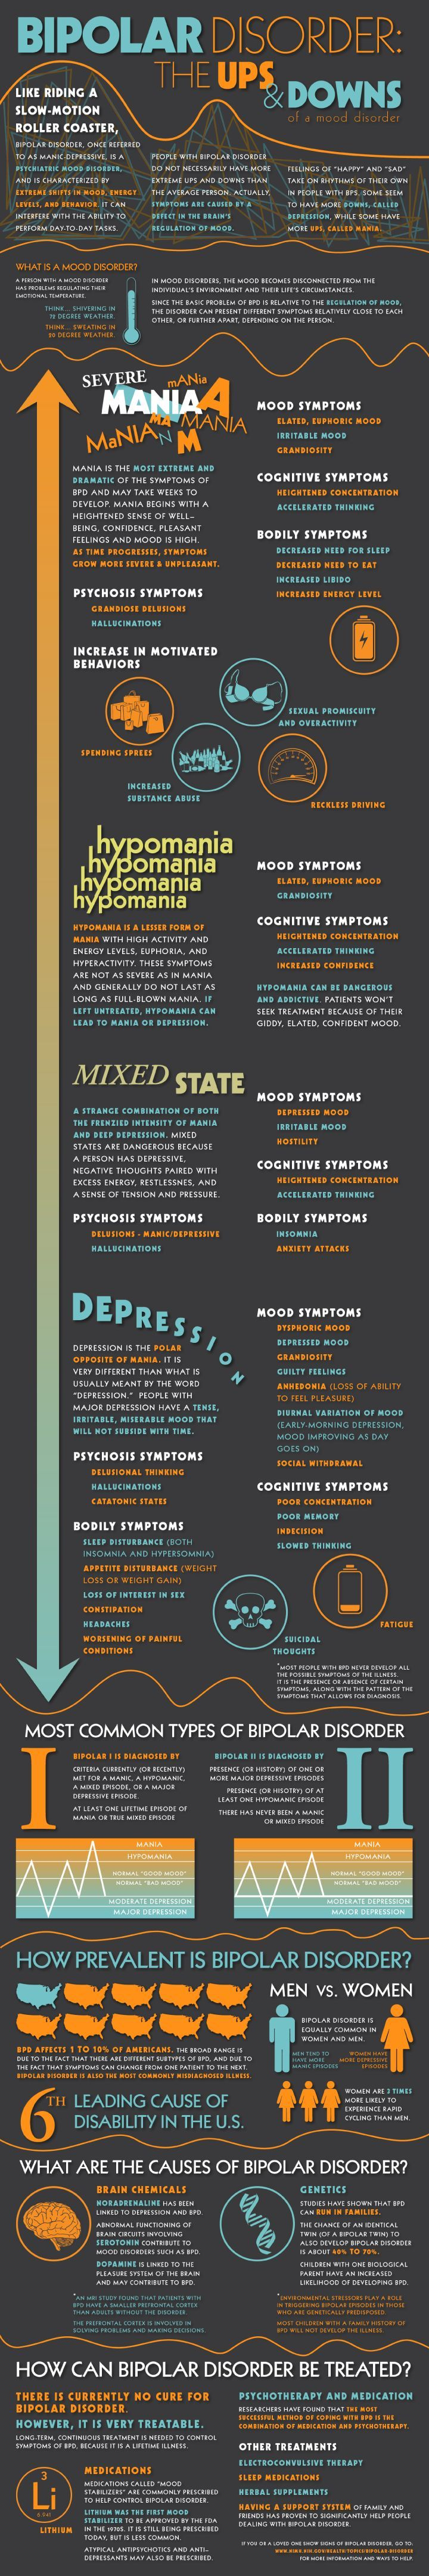 Bipolar Disorder Infographic  #bipolar #depression